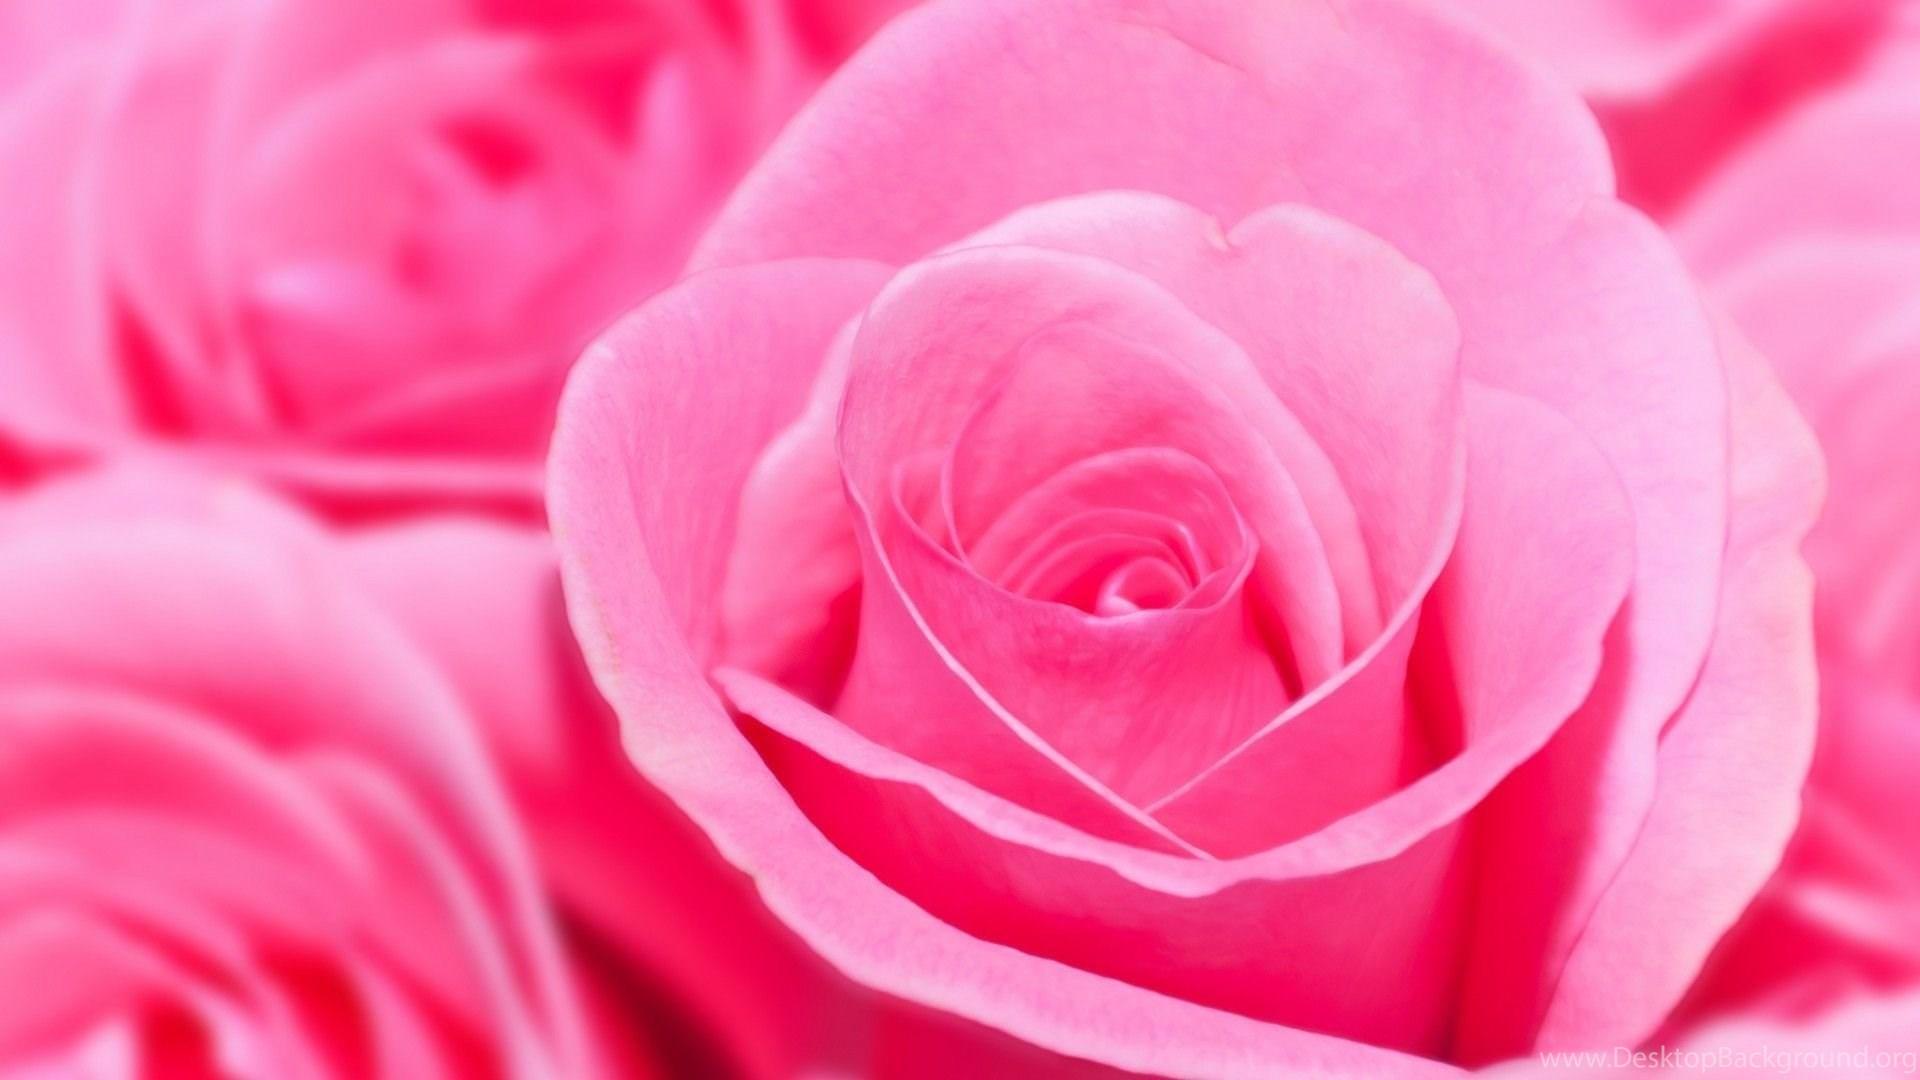 Pink Rose HD Wallpapers Desktop Background